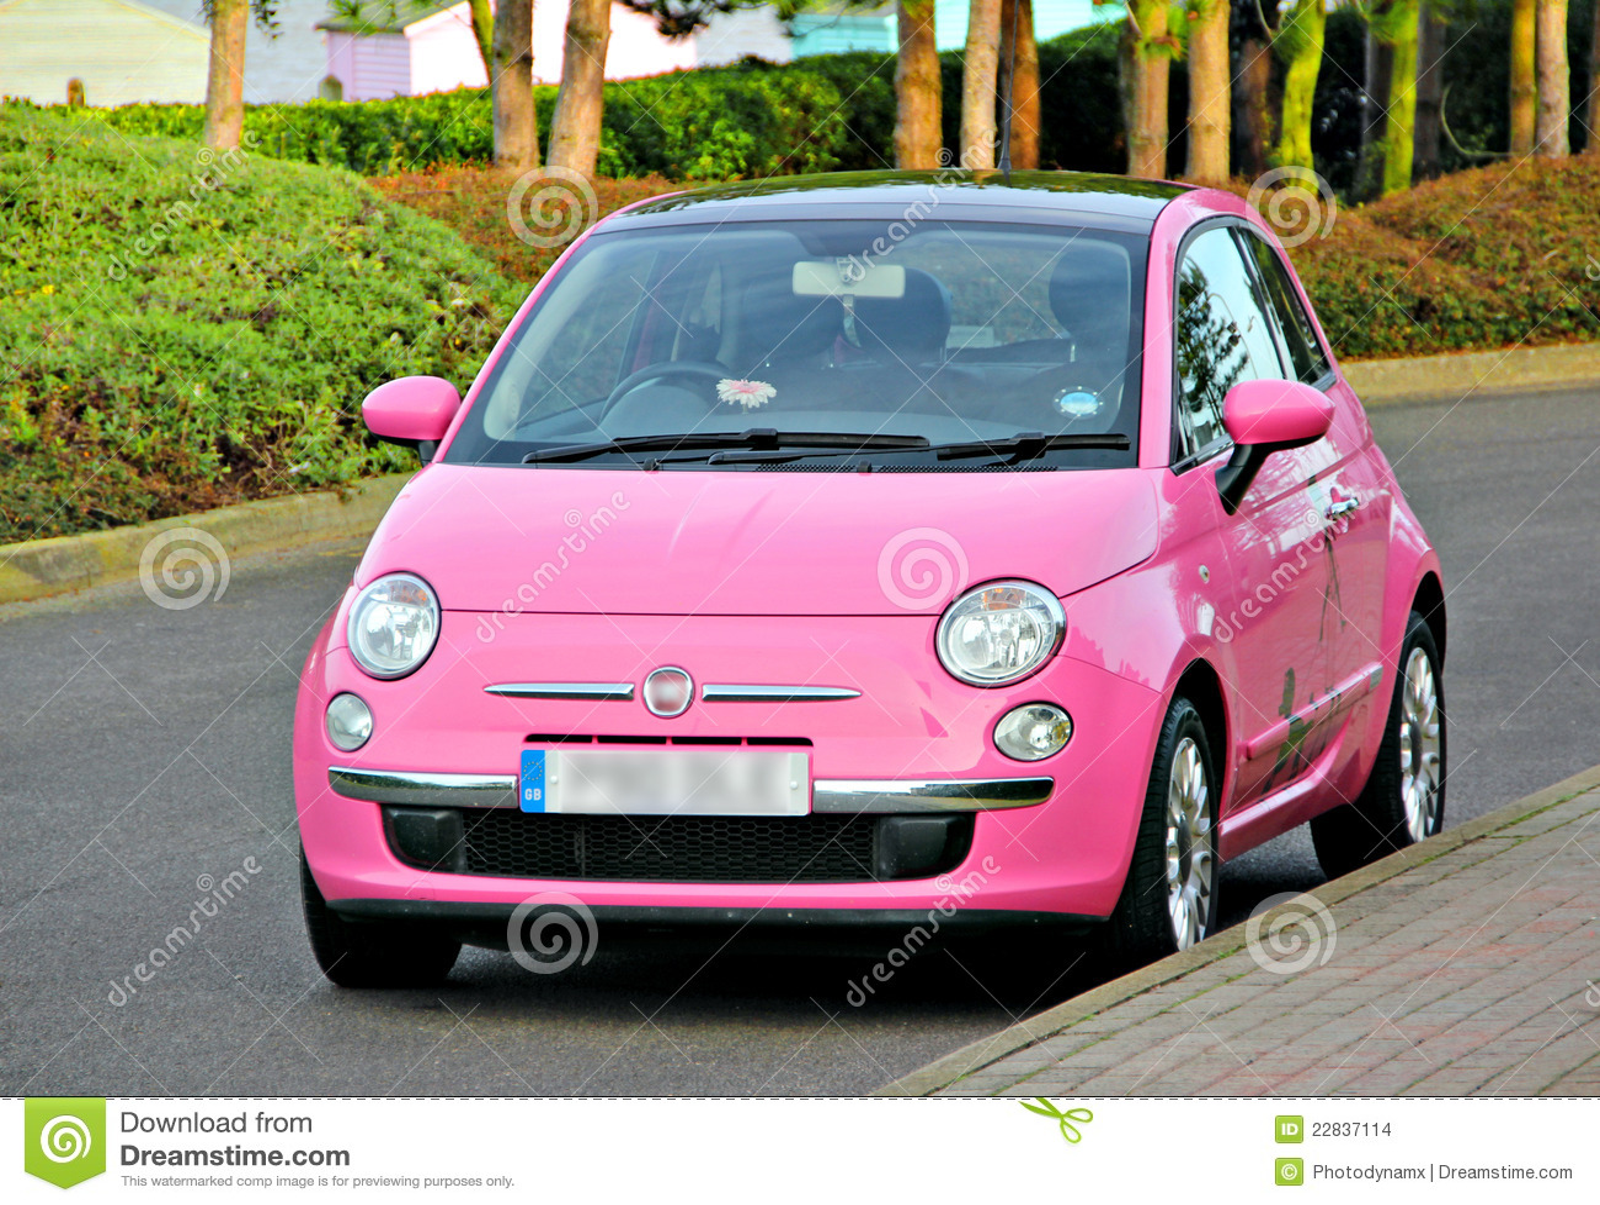 kleines auto des modernen spa rosas stockbilder bild 22837114. Black Bedroom Furniture Sets. Home Design Ideas